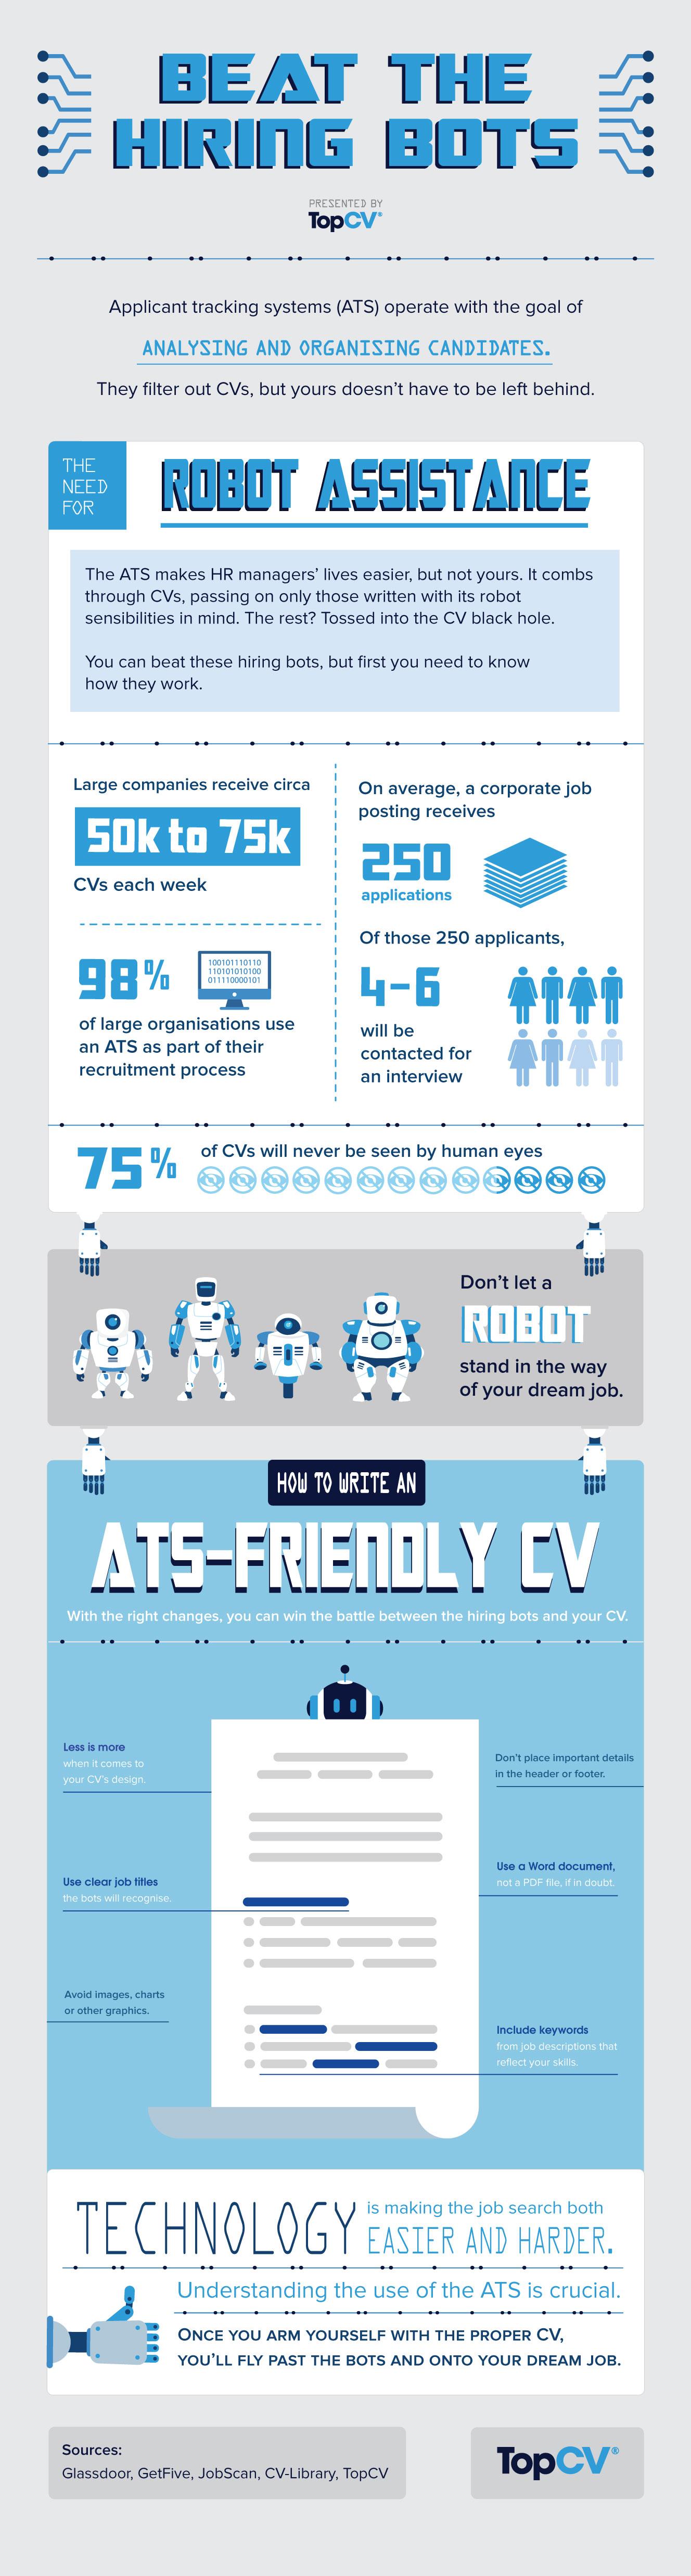 Infographic_How_to_beat_ATS_hiring_bots_CV